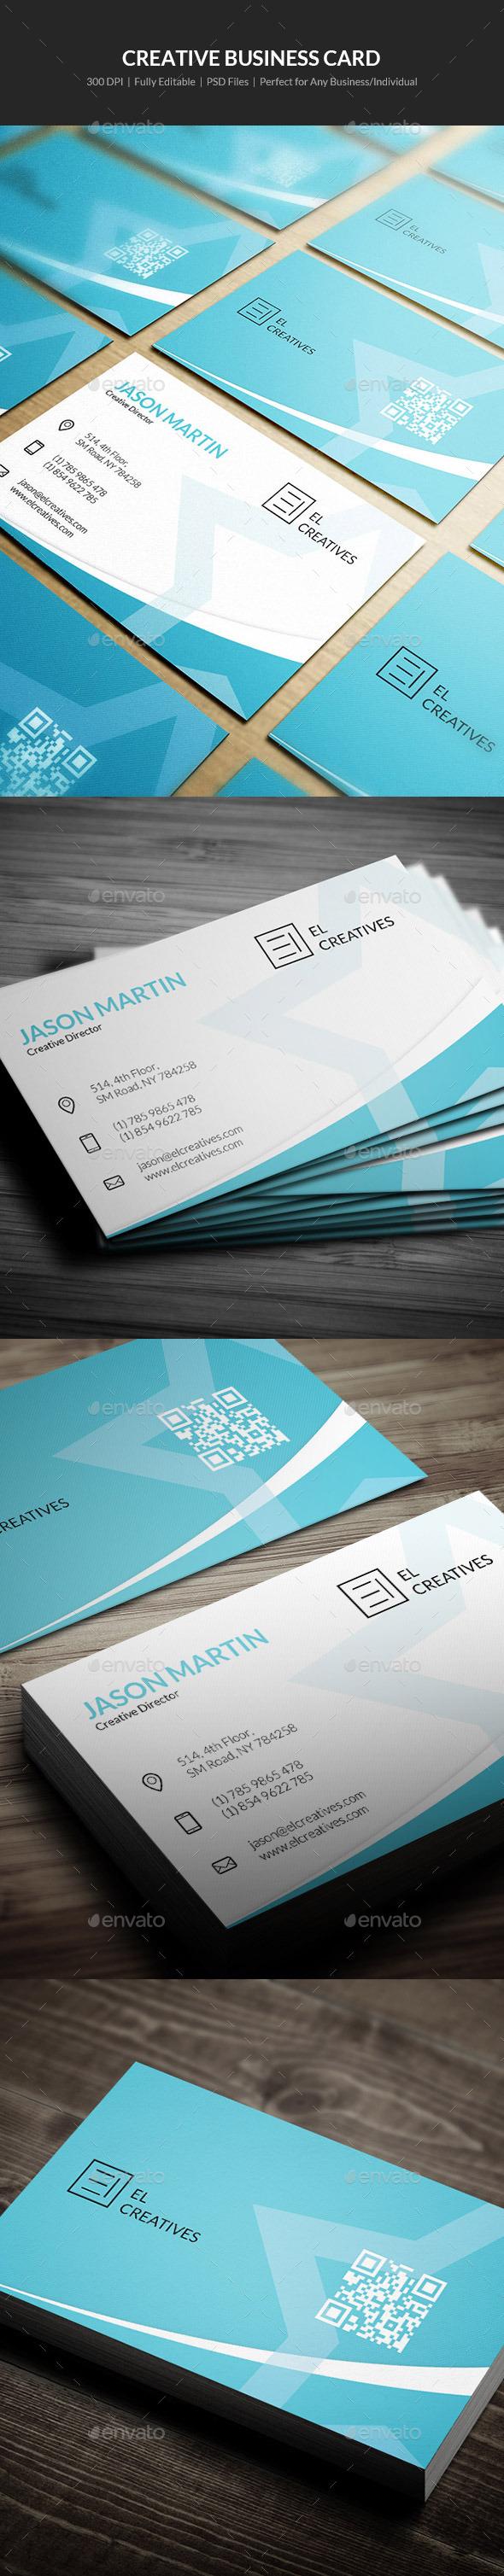 Creative Business Card - 09 - Creative Business Cards